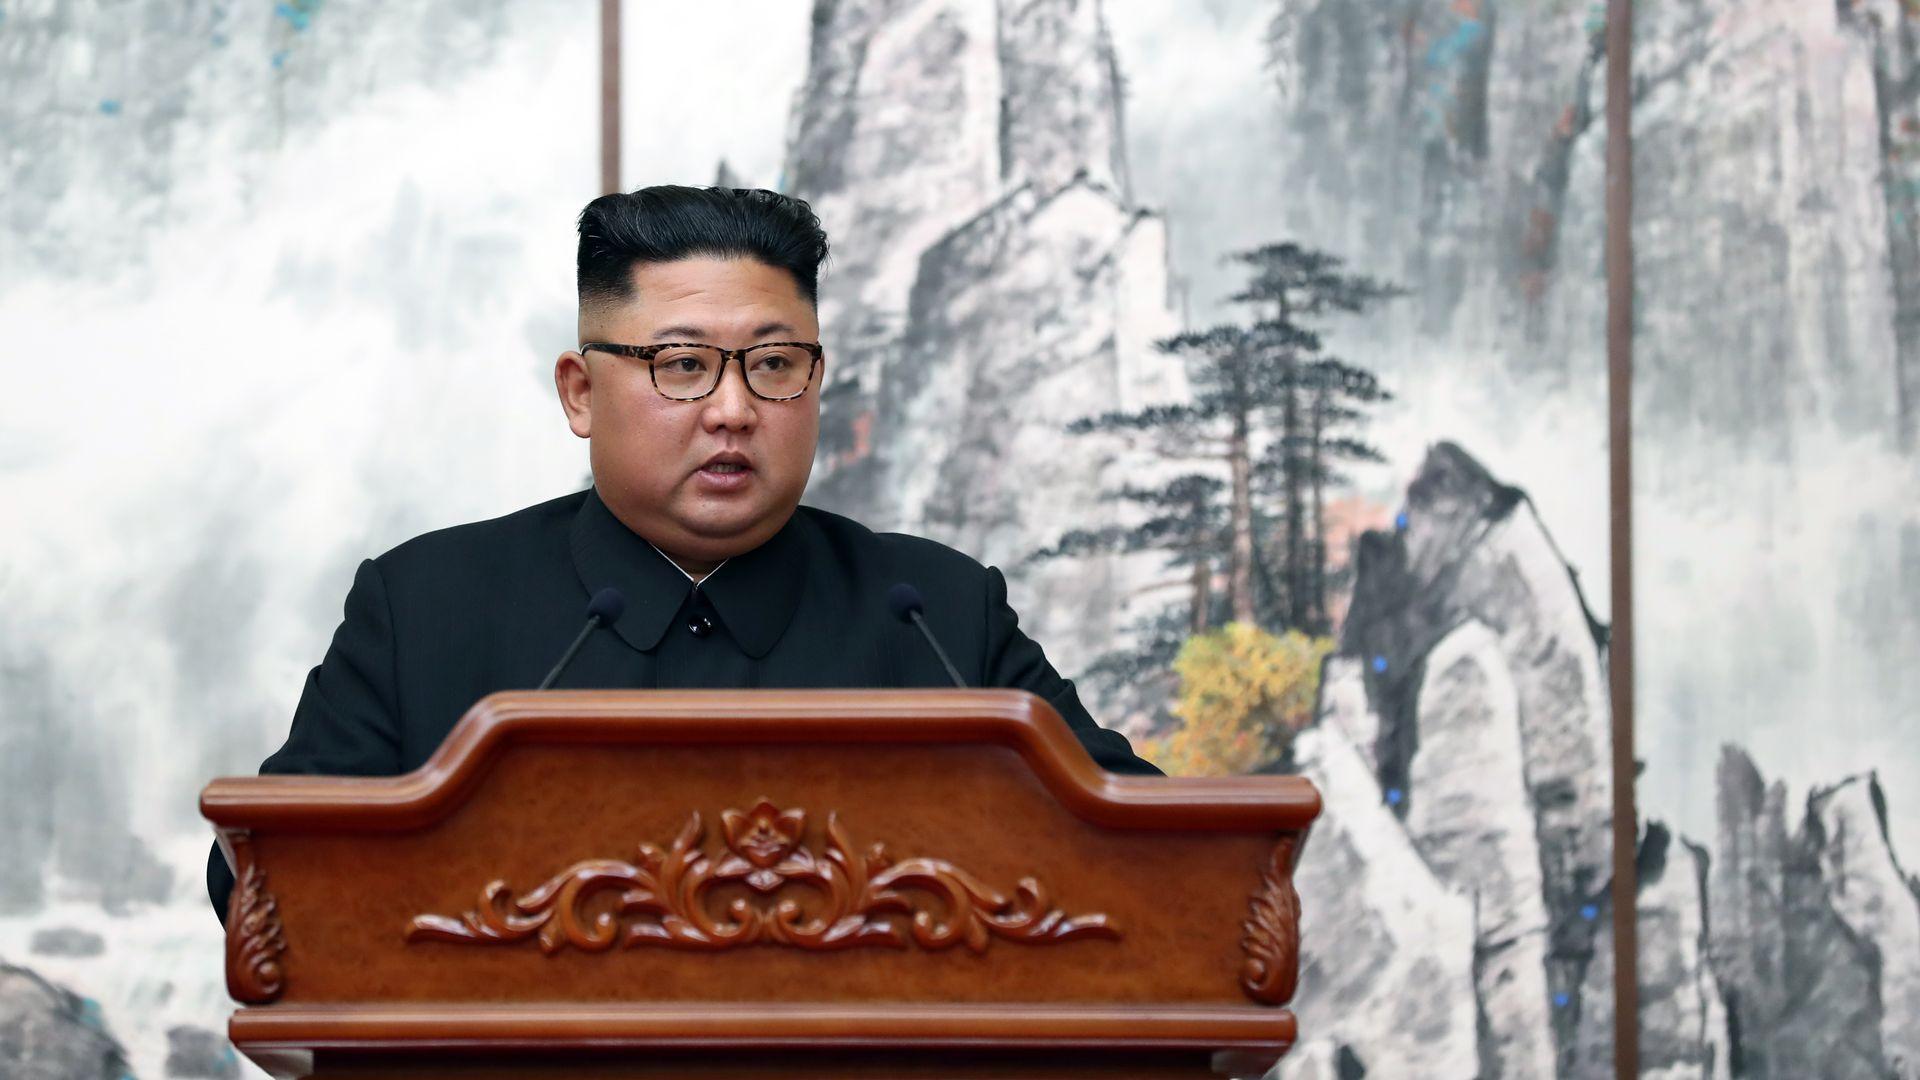 Kim Jong un behind a podium